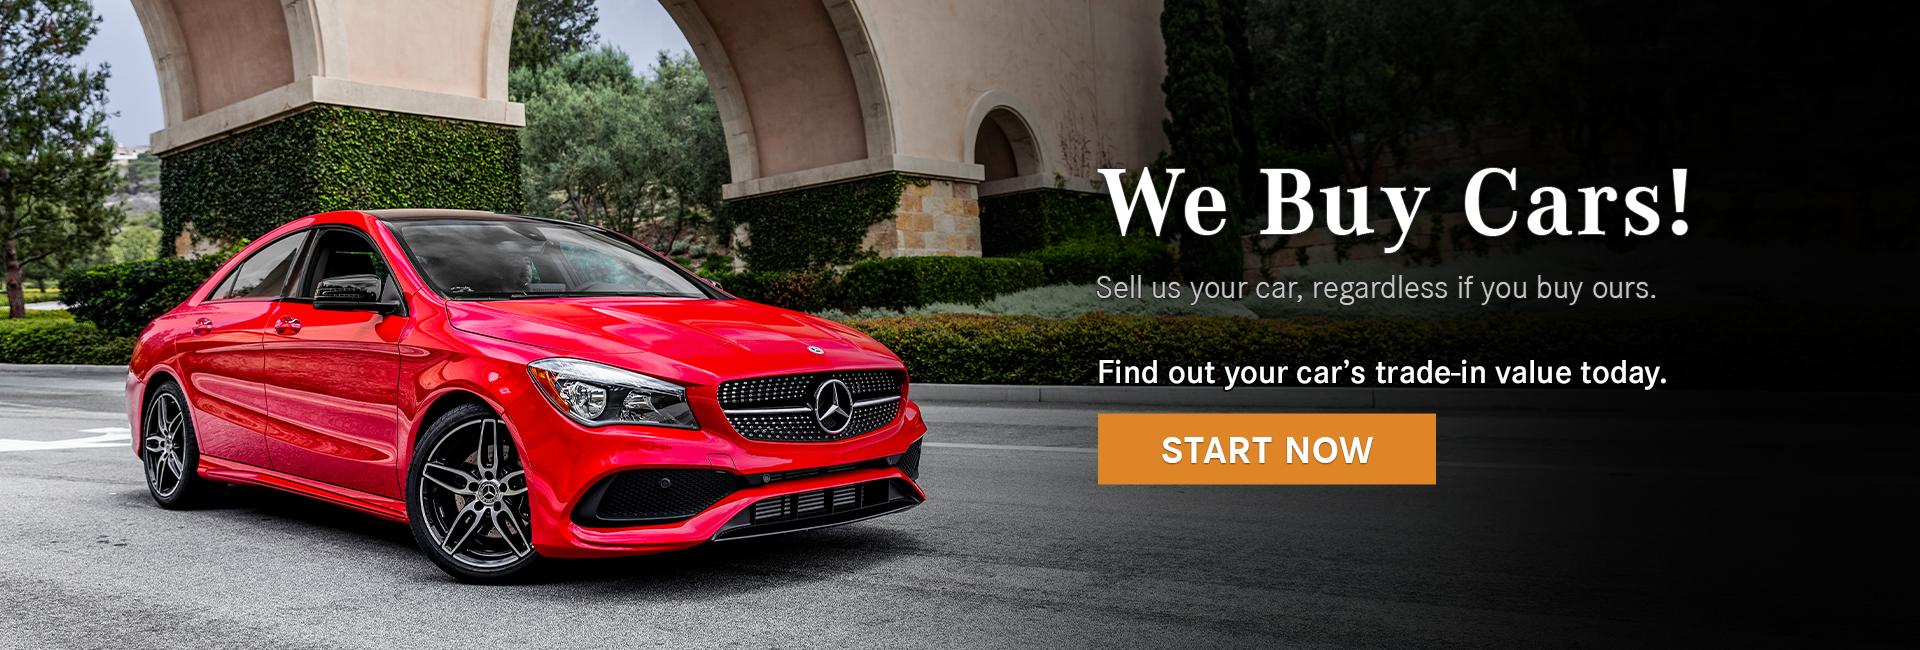 Maui We Buy Cars Homepage Slider